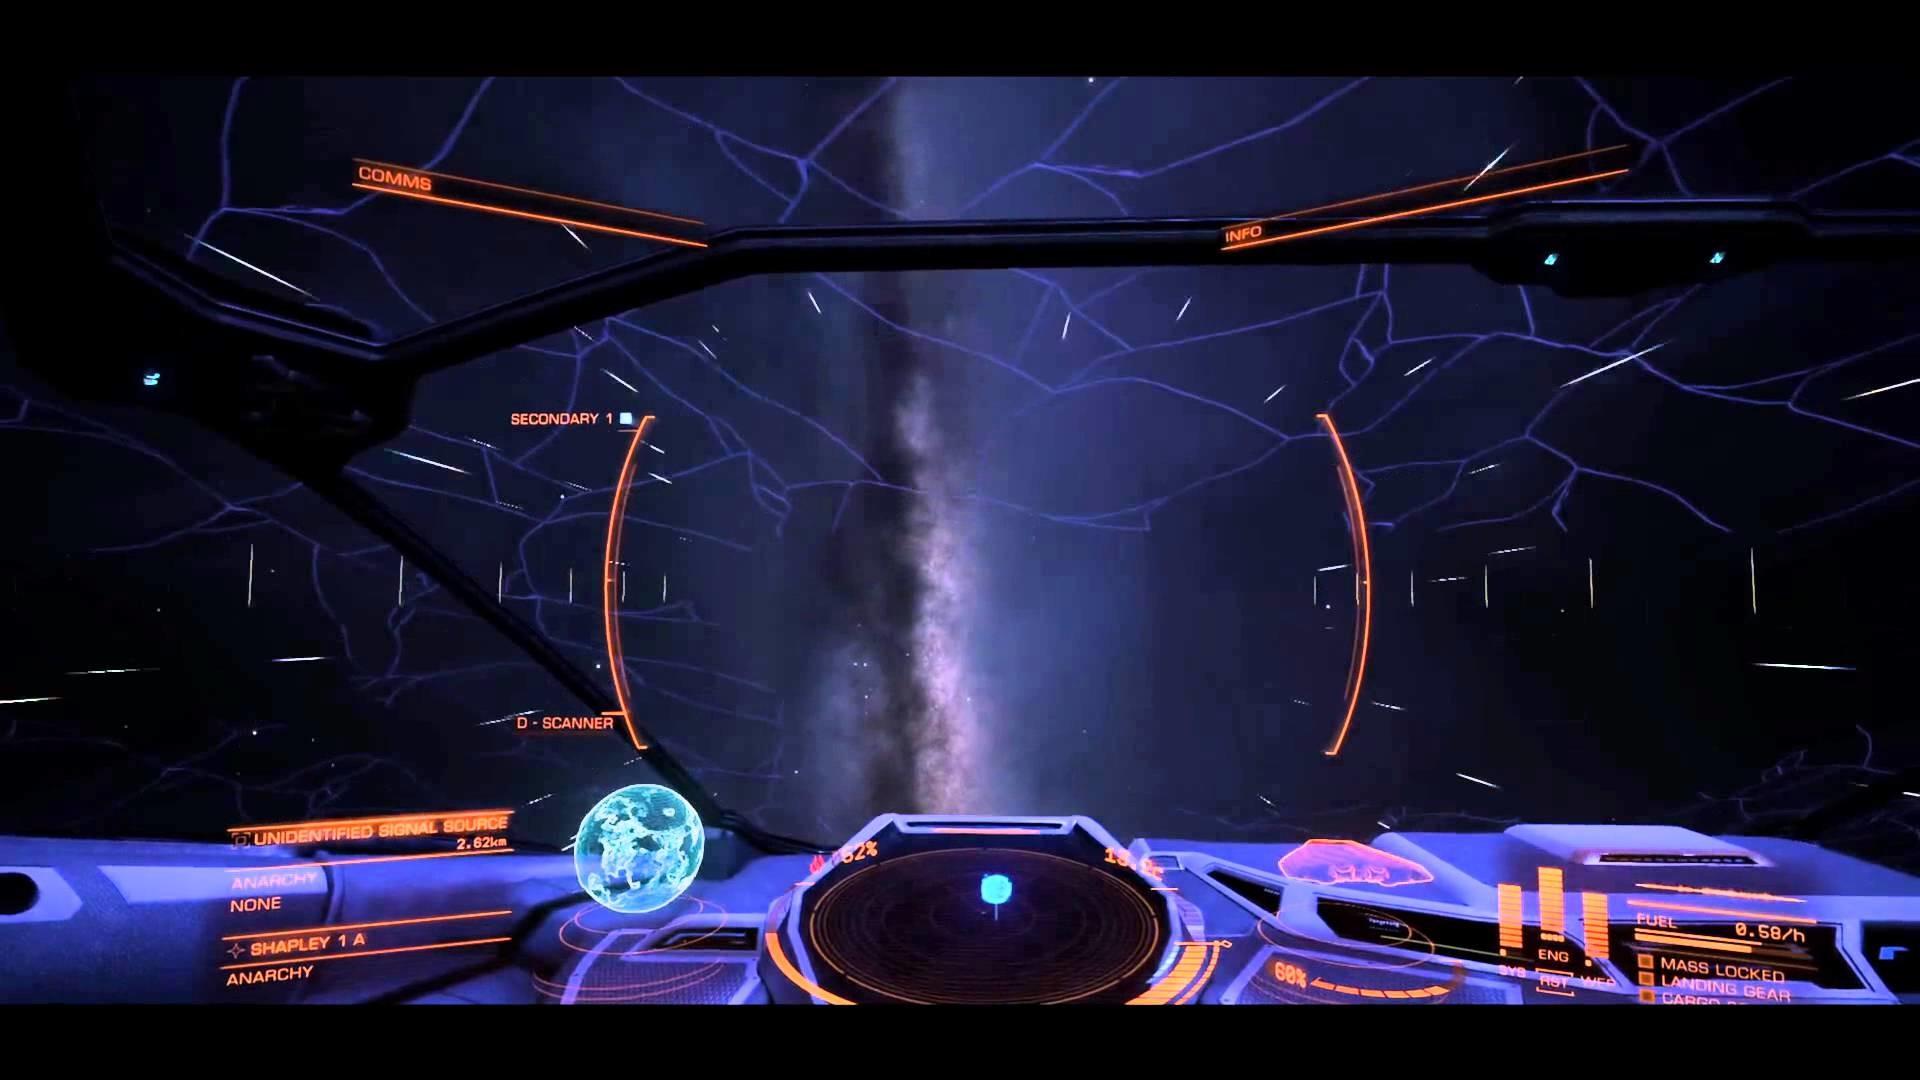 Elite Dangerous – New Horizons Part 10 (The Return Home, via a Wolf-Rayet  Star) 1080p – YouTube